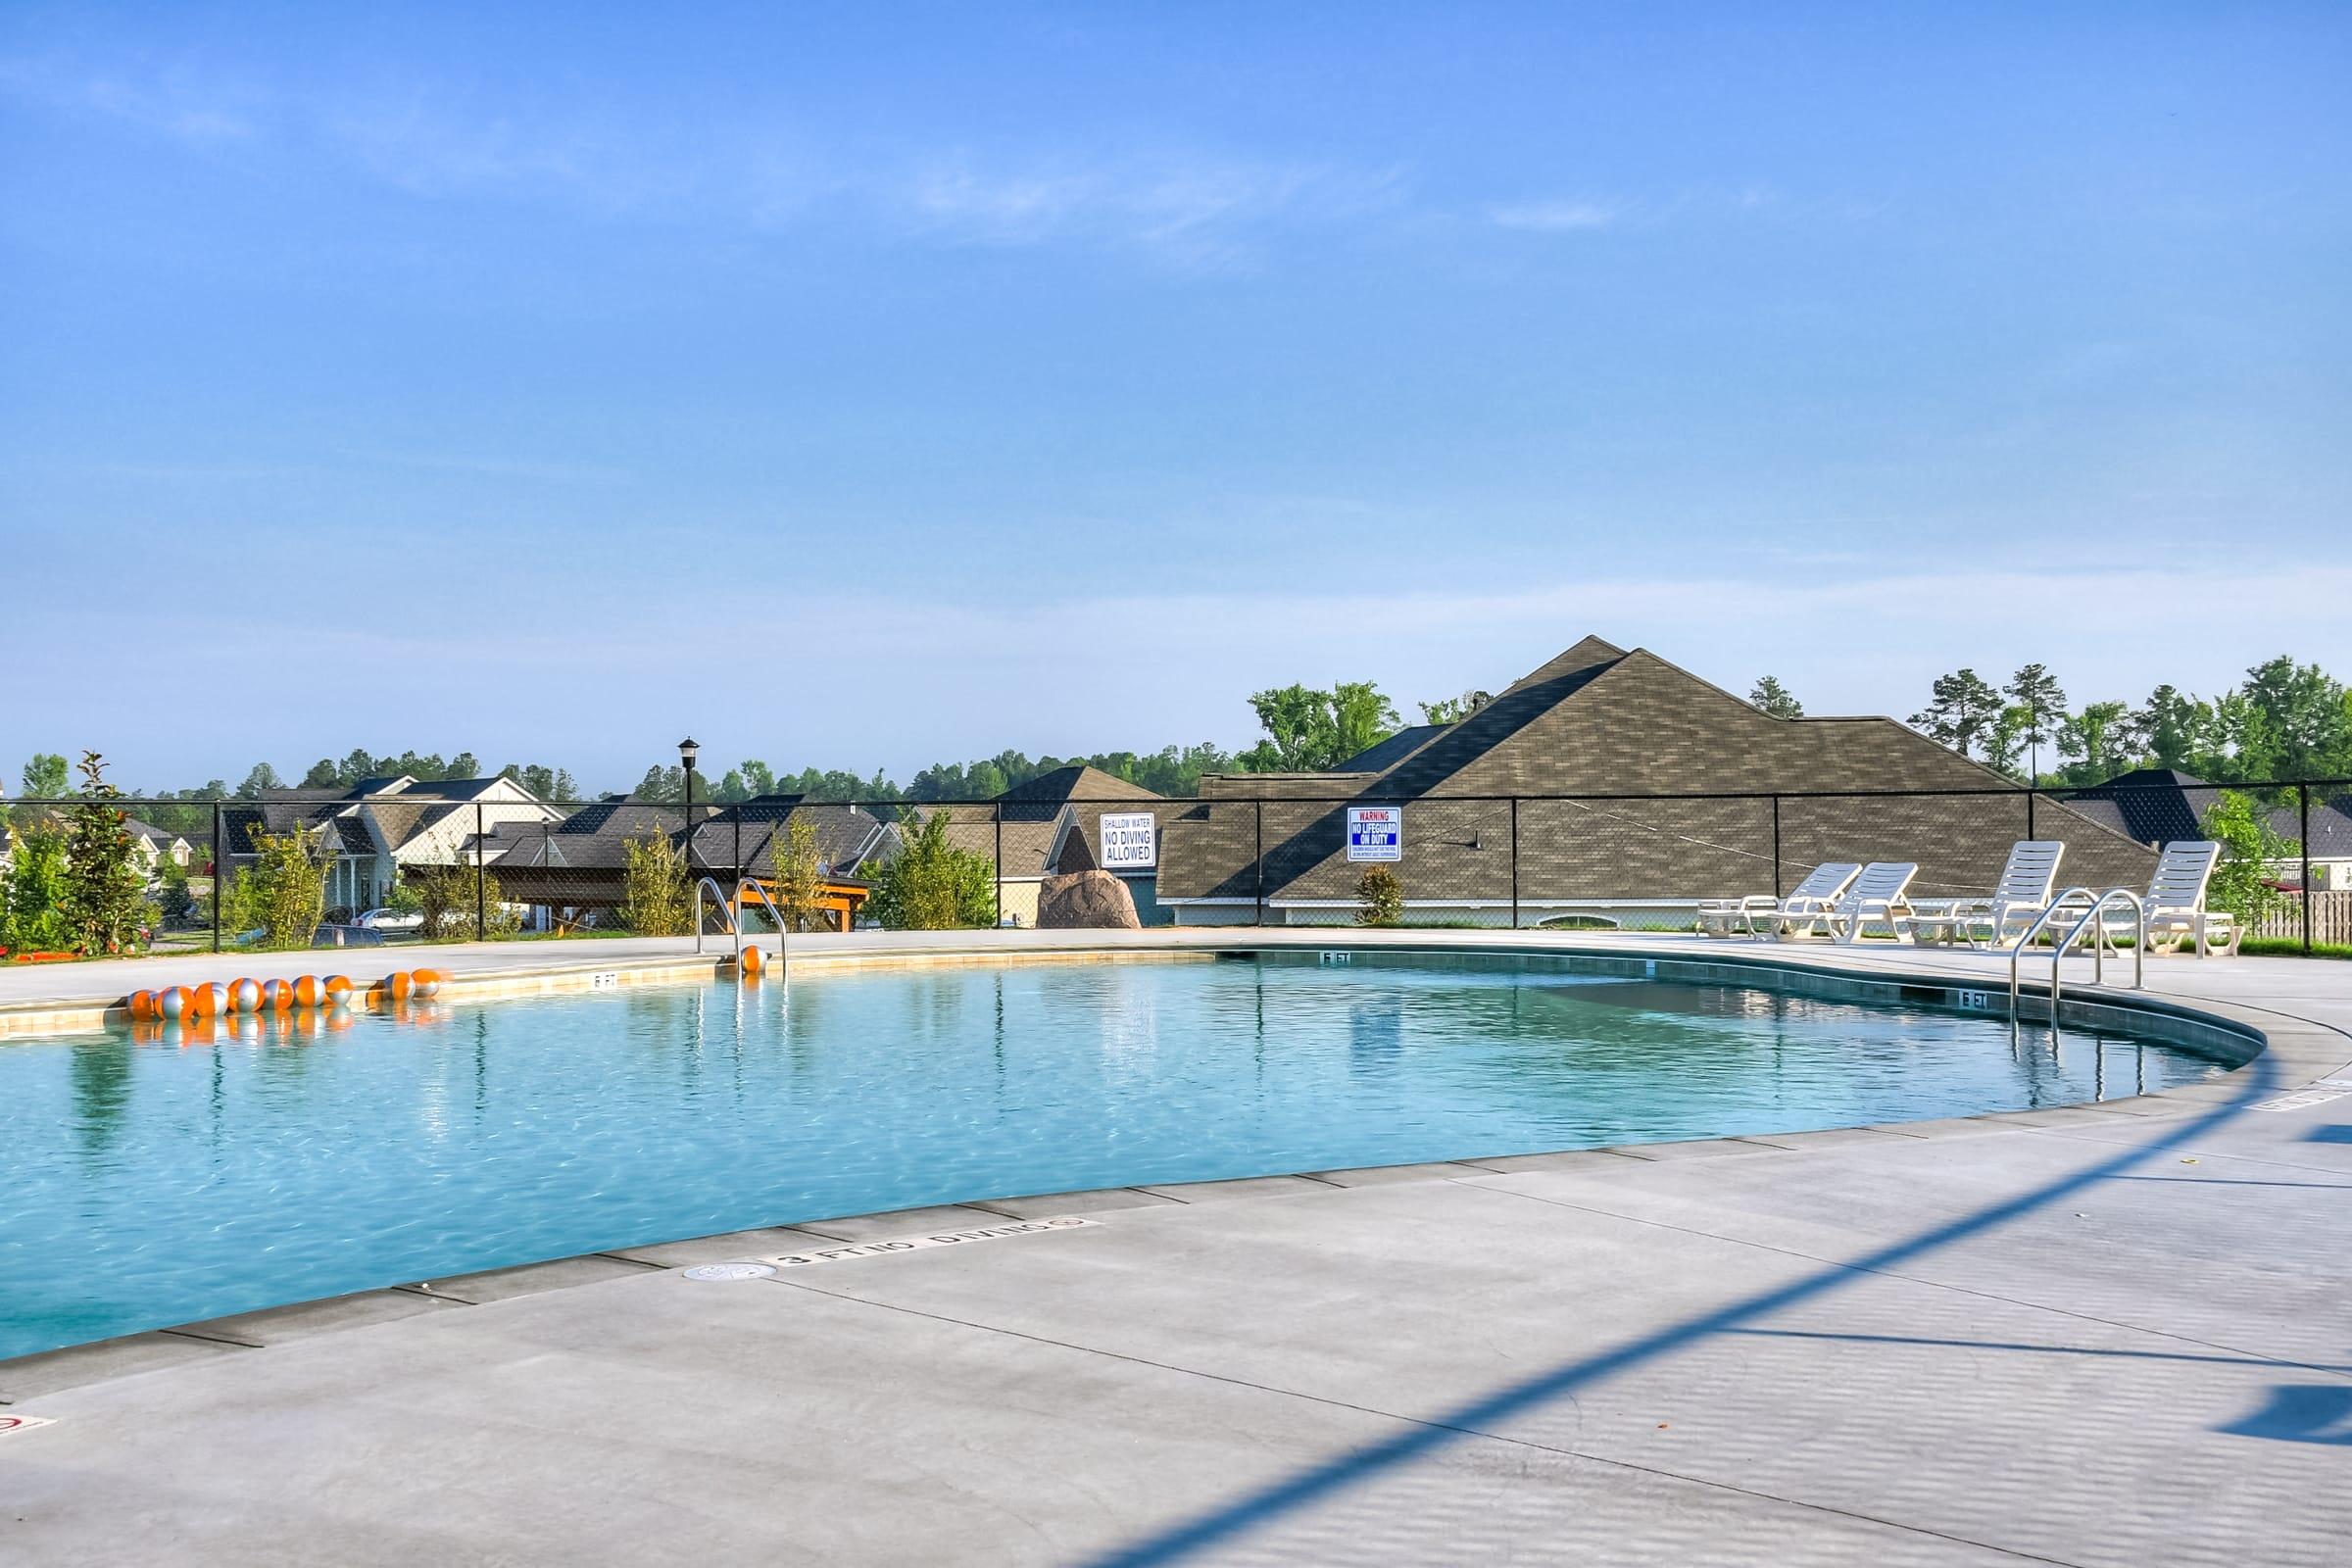 An image of the pool area of Kelarie neighborhood.